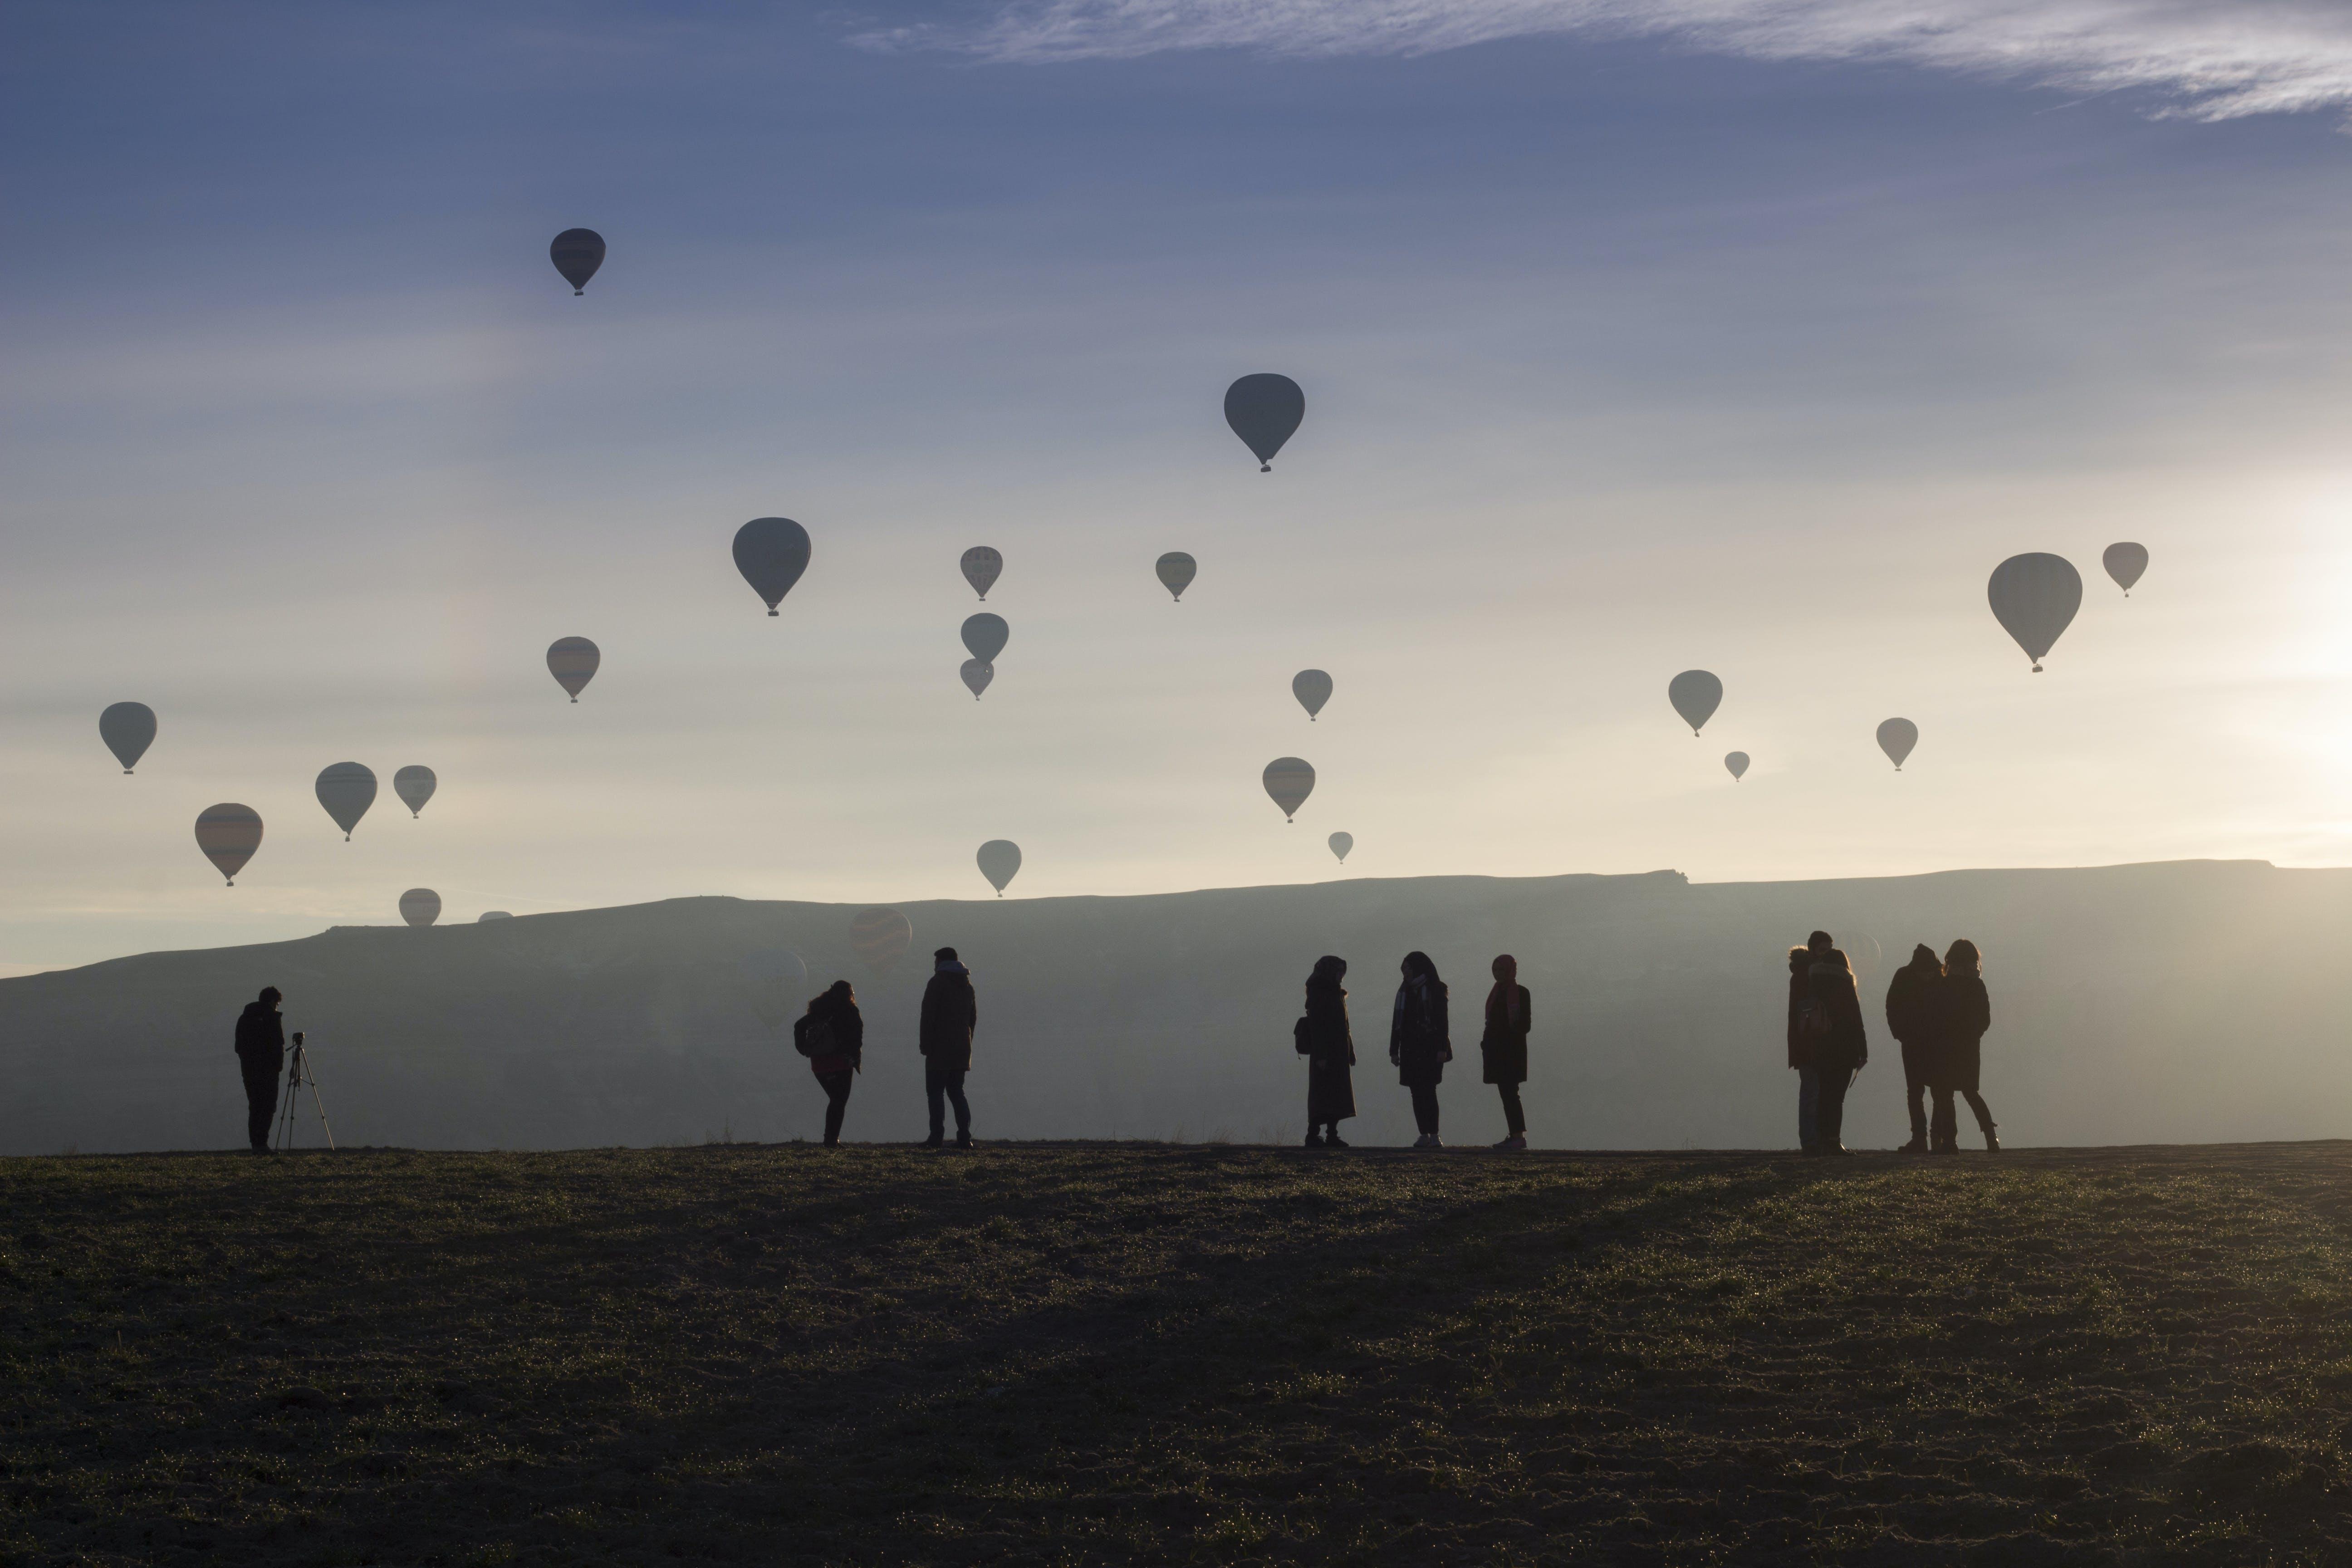 Free stock photo of people, valley, cappadocia, hot air balloons